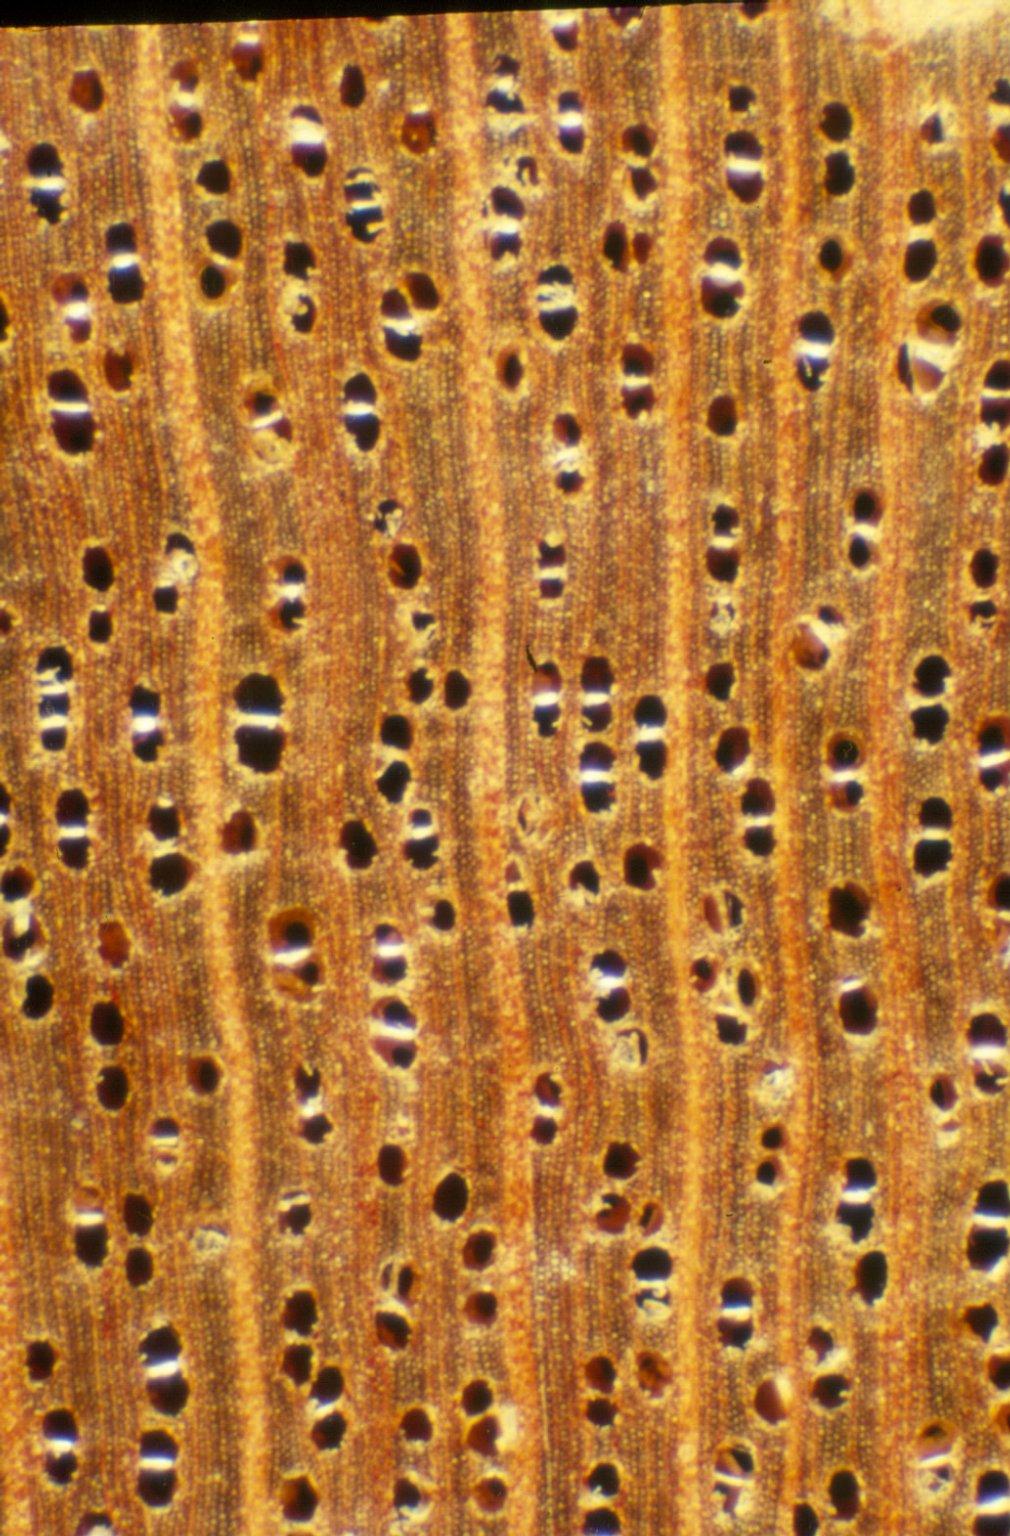 CLUSIACEAE Chrysochlamys floribunda